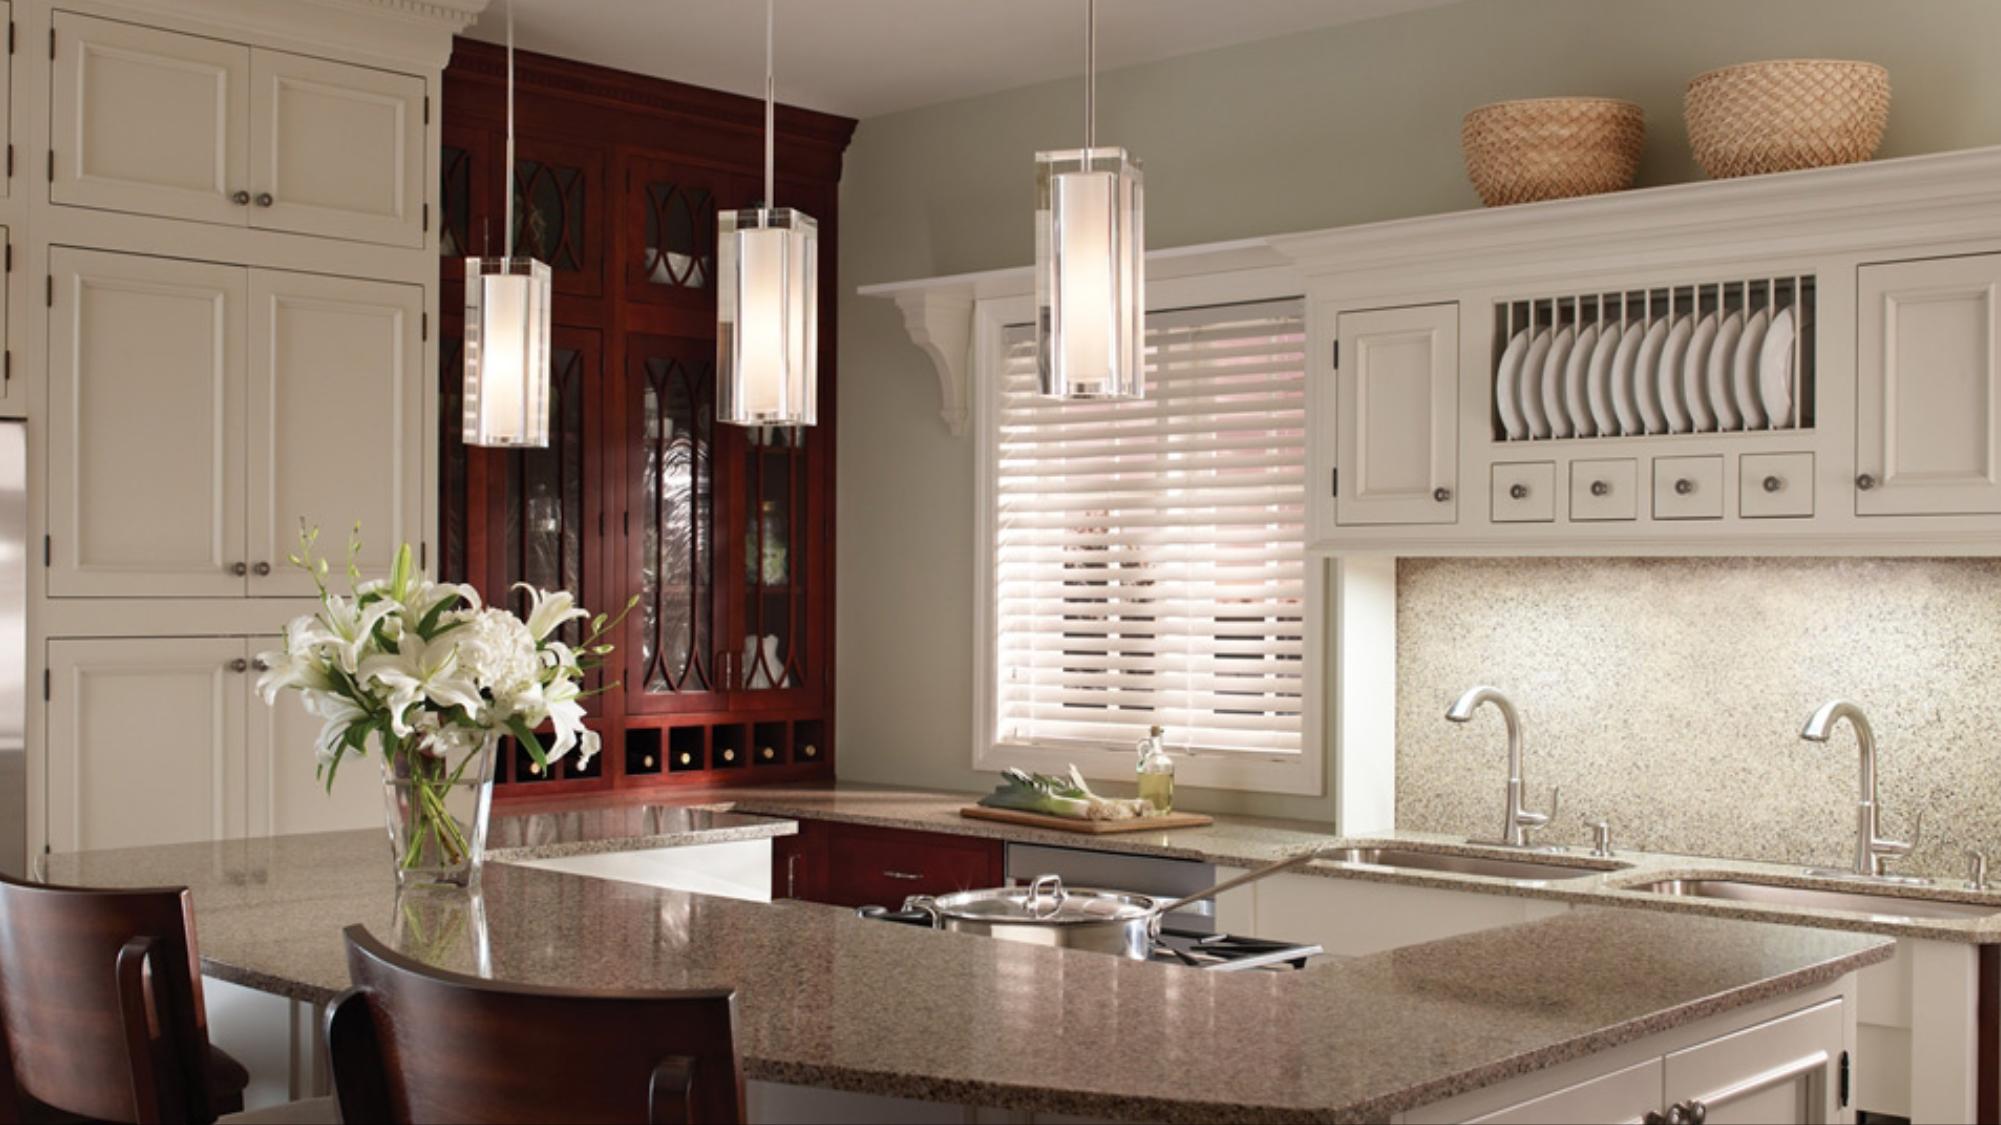 Pinlightwave Lighting On Lightwave Lighting  Pinterest Captivating Kitchen Light Bulbs Design Inspiration